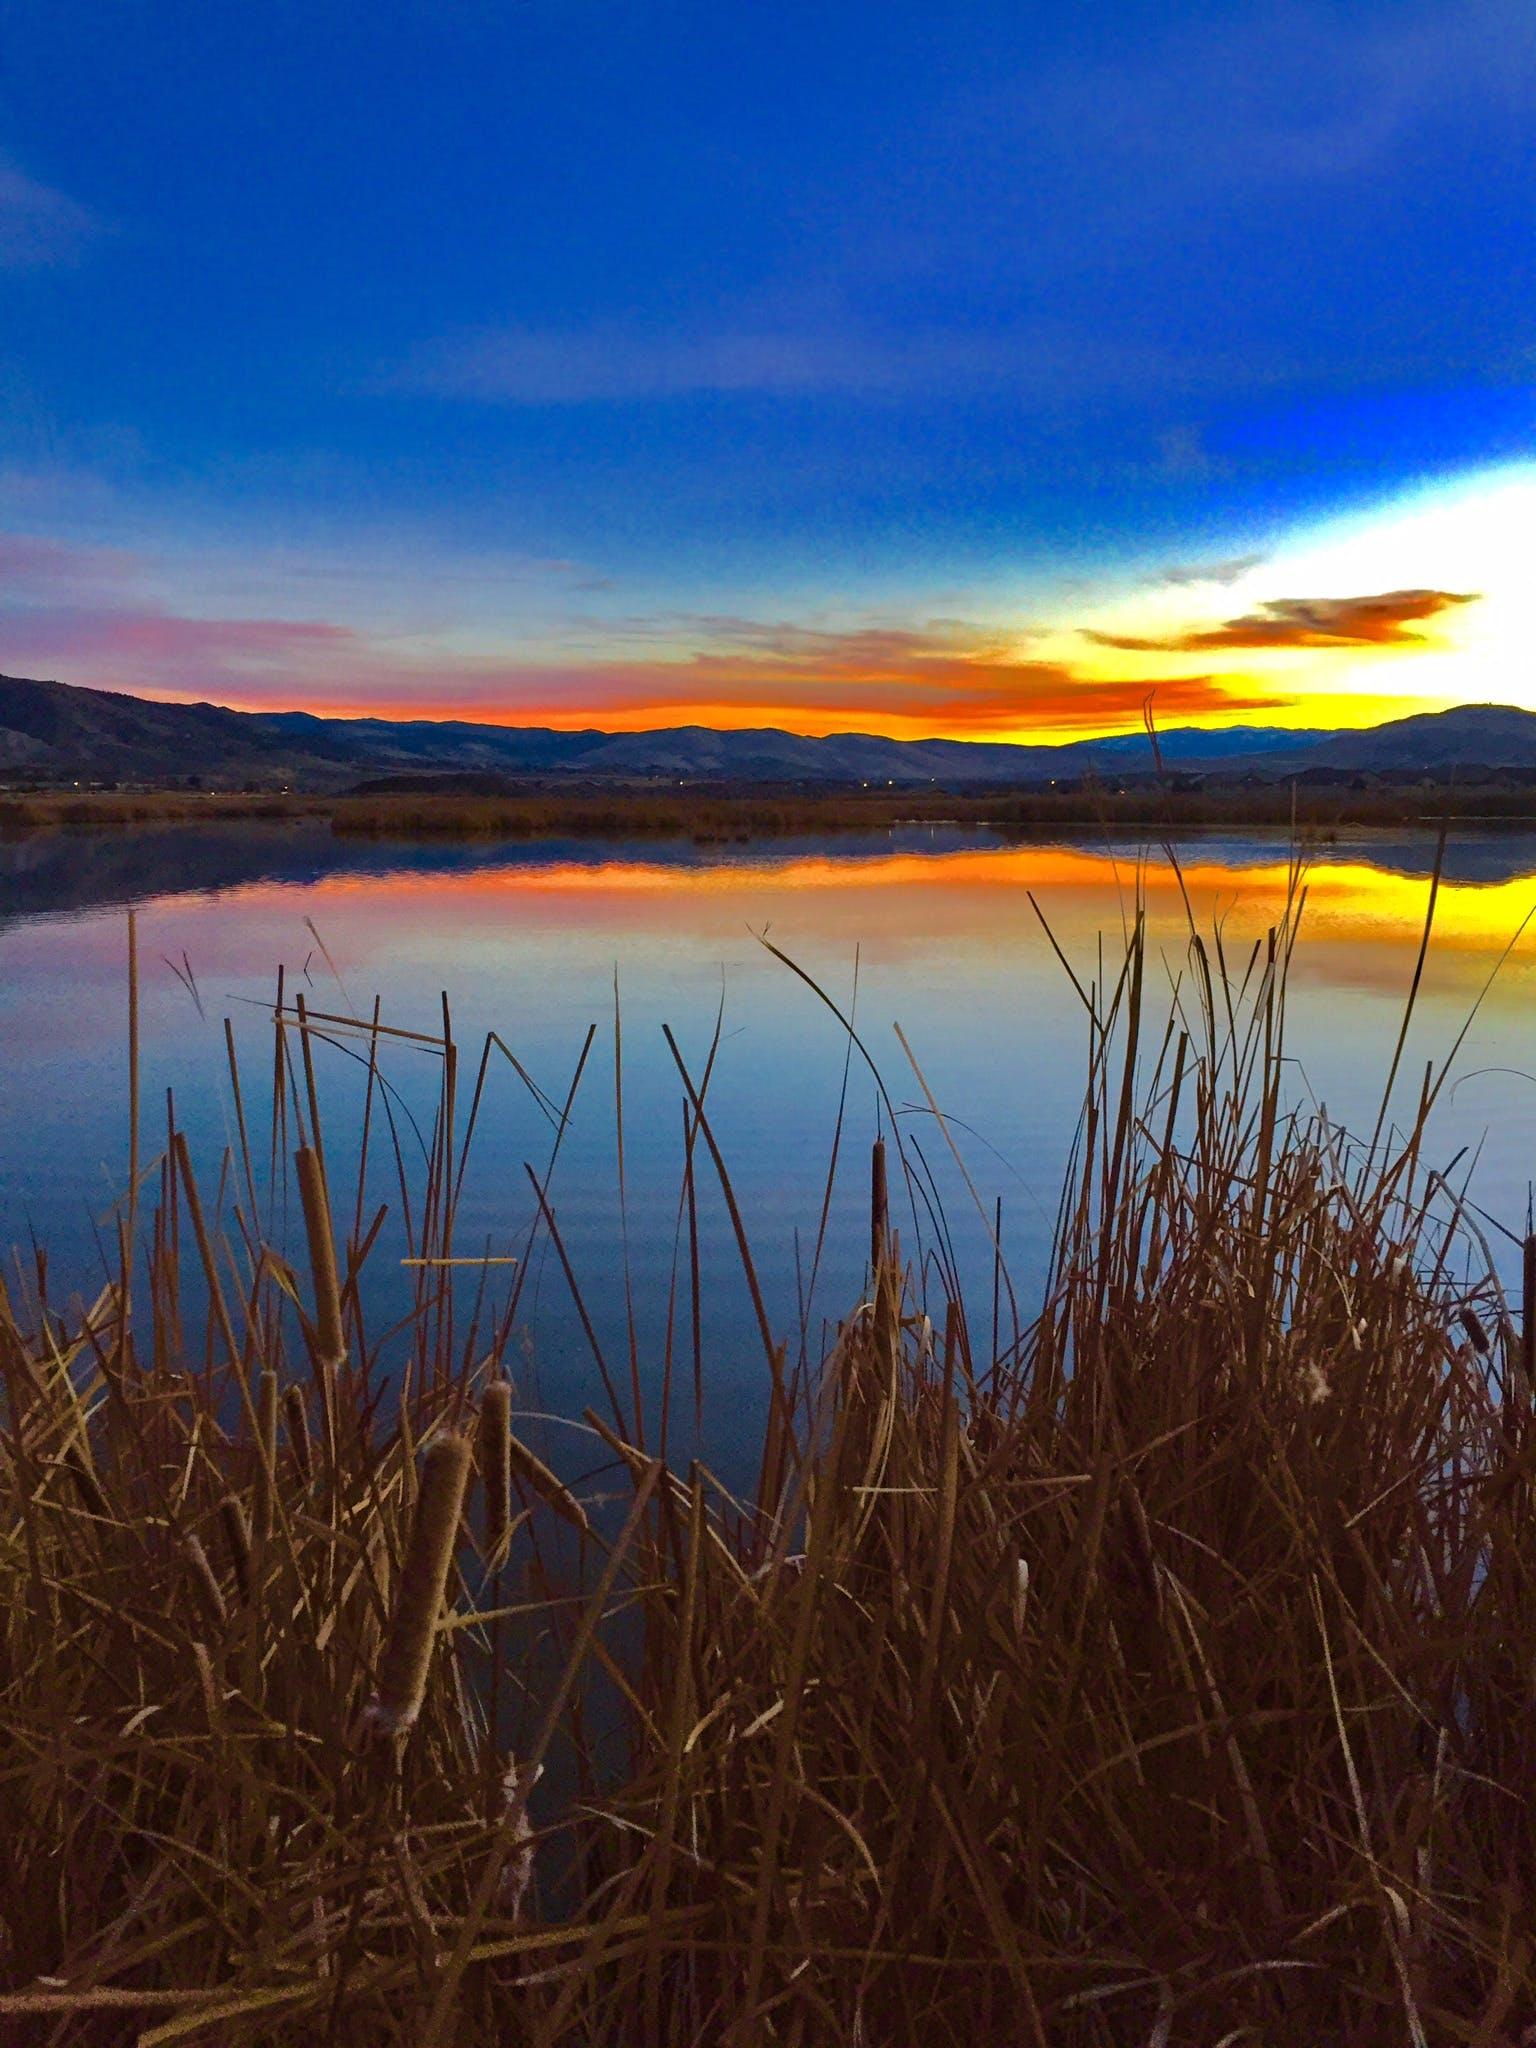 Free stock photo of reflections, Reno, sunset